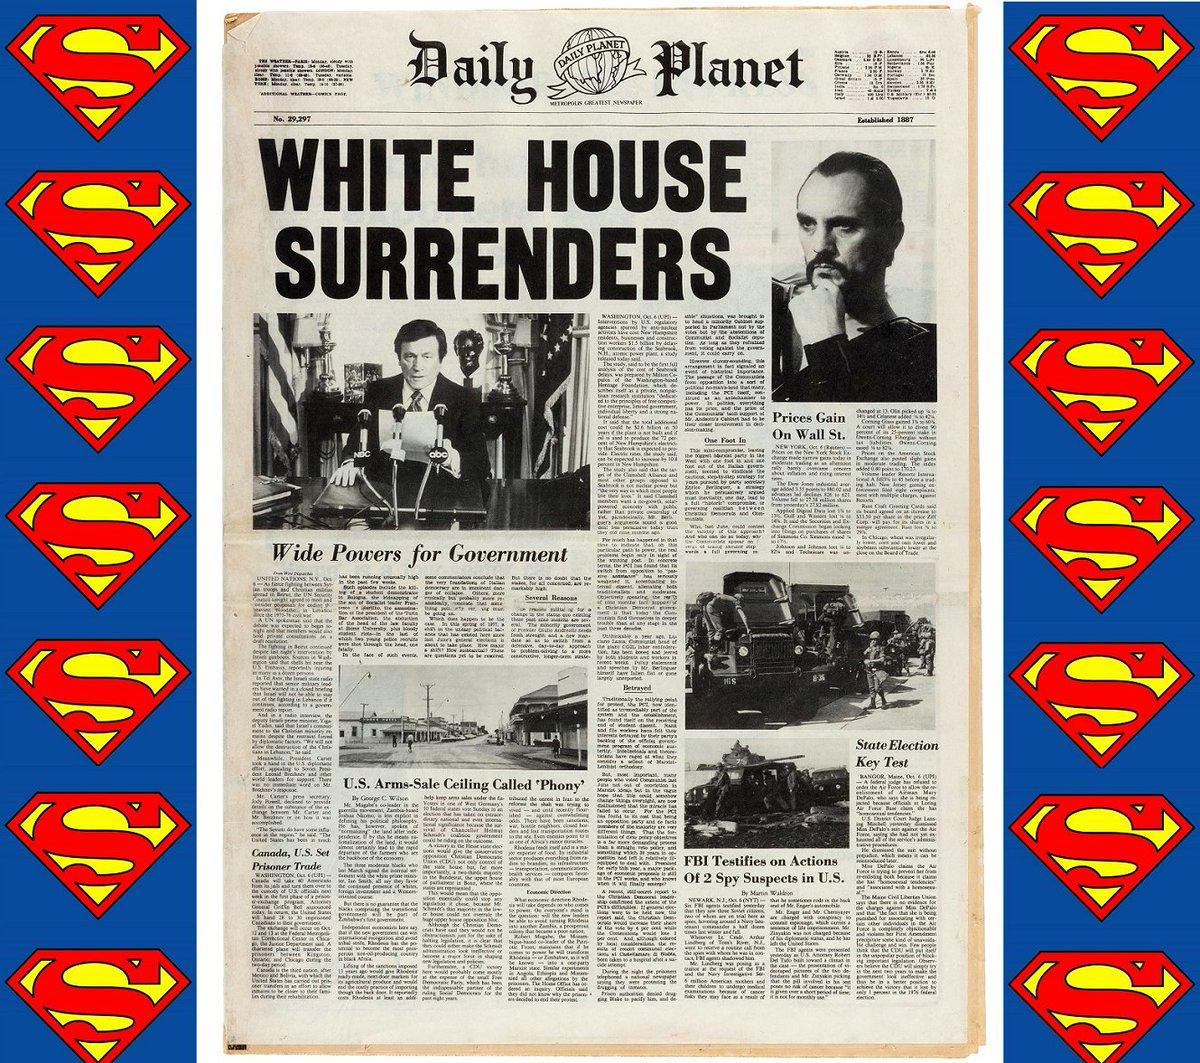 #Hakes229 Sneak Peek! @HakesAuctions' next sale includes this #movieprop #DailyPlanet #newspaper from #SupermanII! A must have for #SupermanFans! #DCComics #WarnerBros #Superman #ChristopherReeve #GeneralZod #TerenceStamp #movieprops #SupermanFans #KneeelBeforeZodpic.twitter.com/cMXLWUIjlF